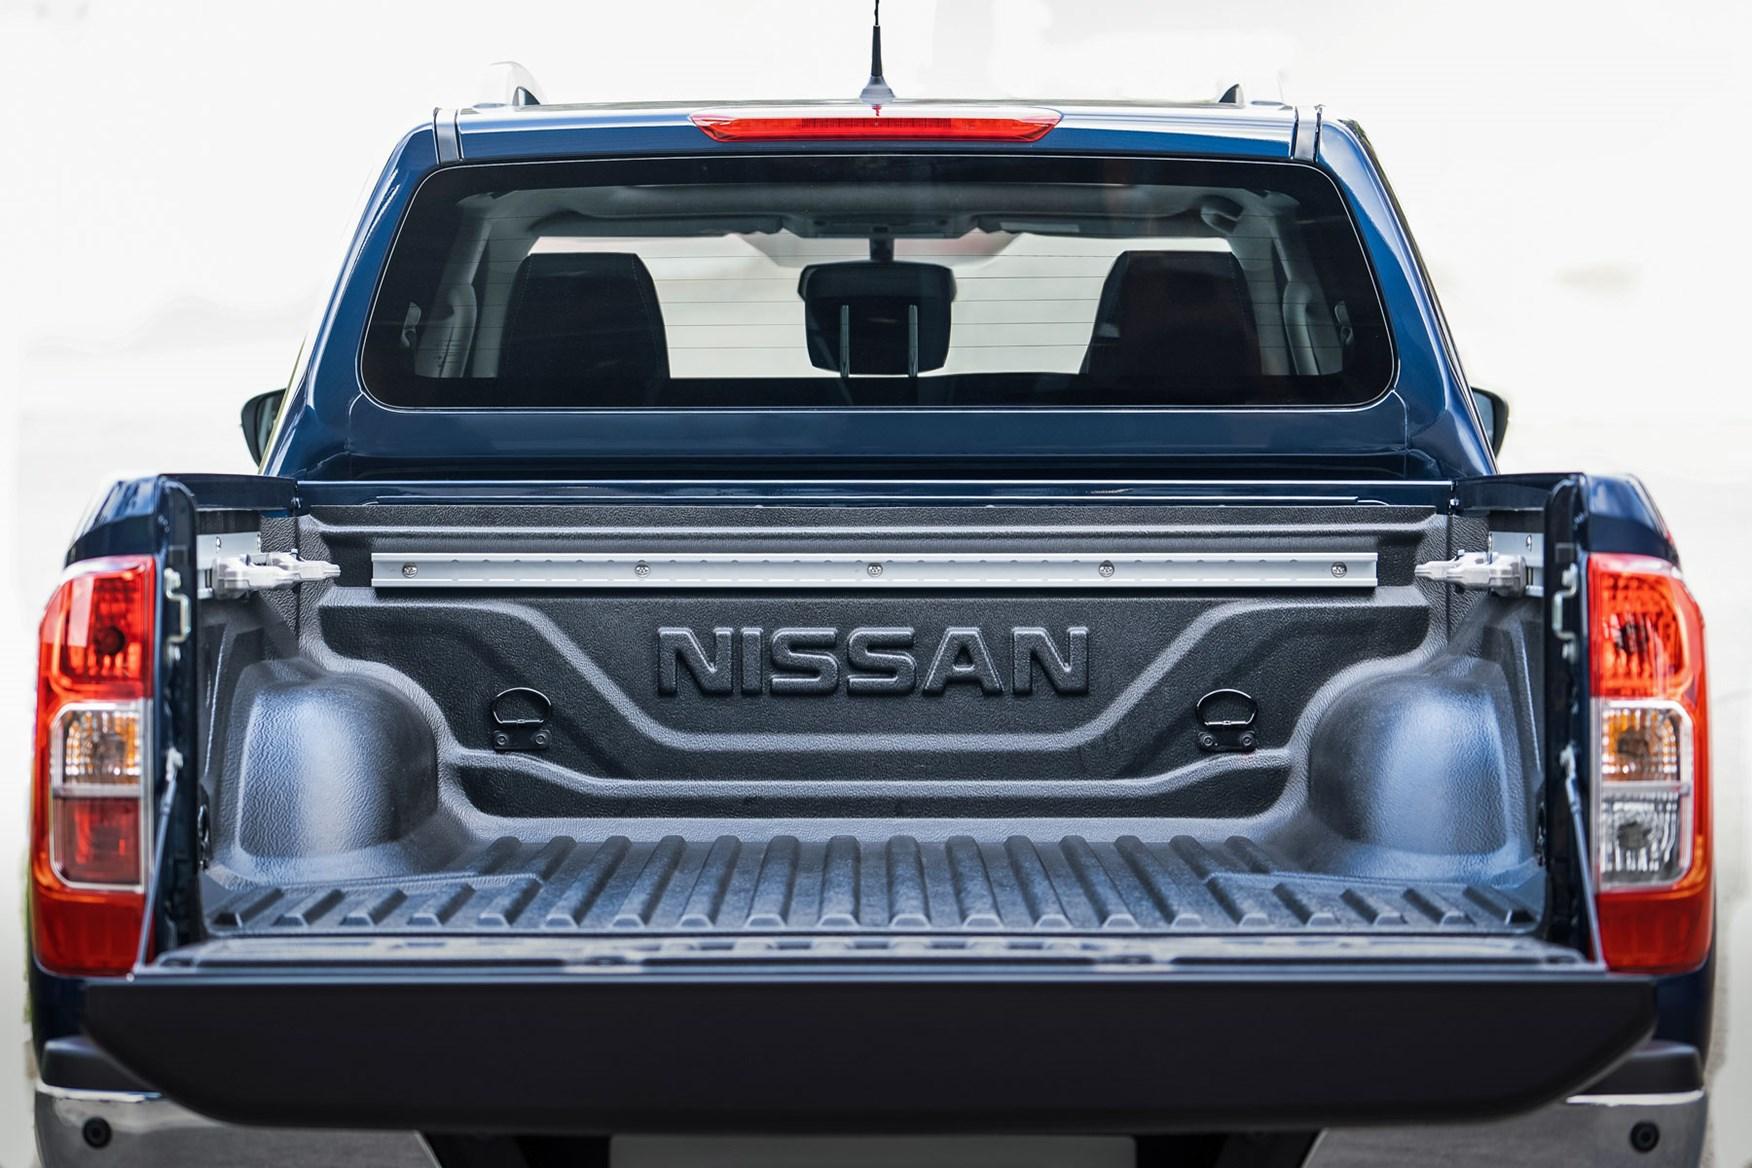 2019 Nissan Navara facelift - more payload, more torque